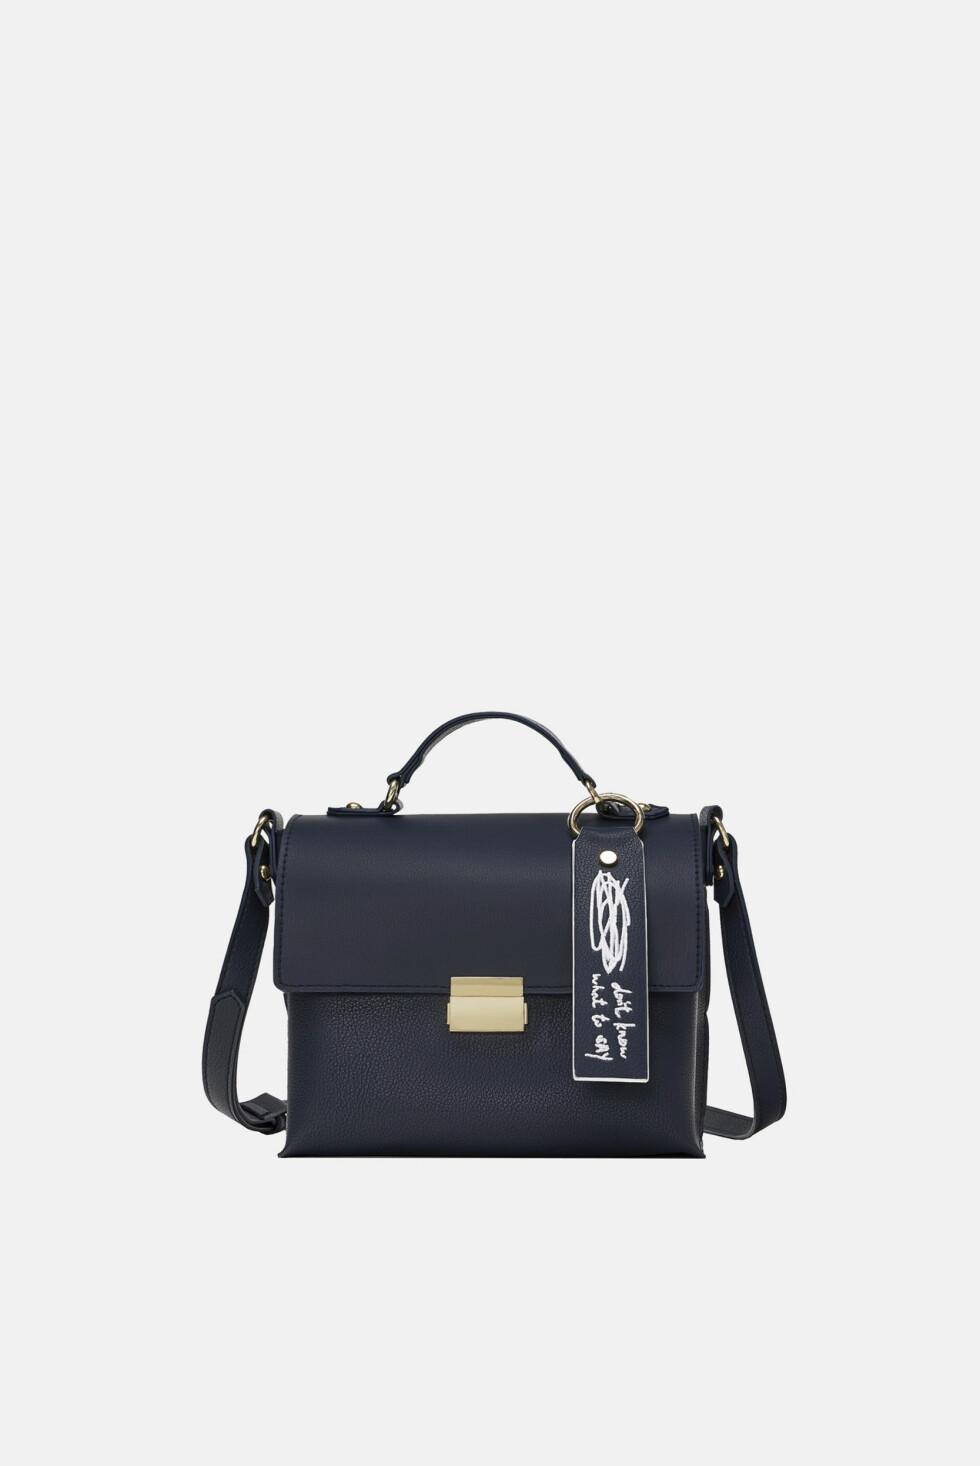 Zara, kr 200